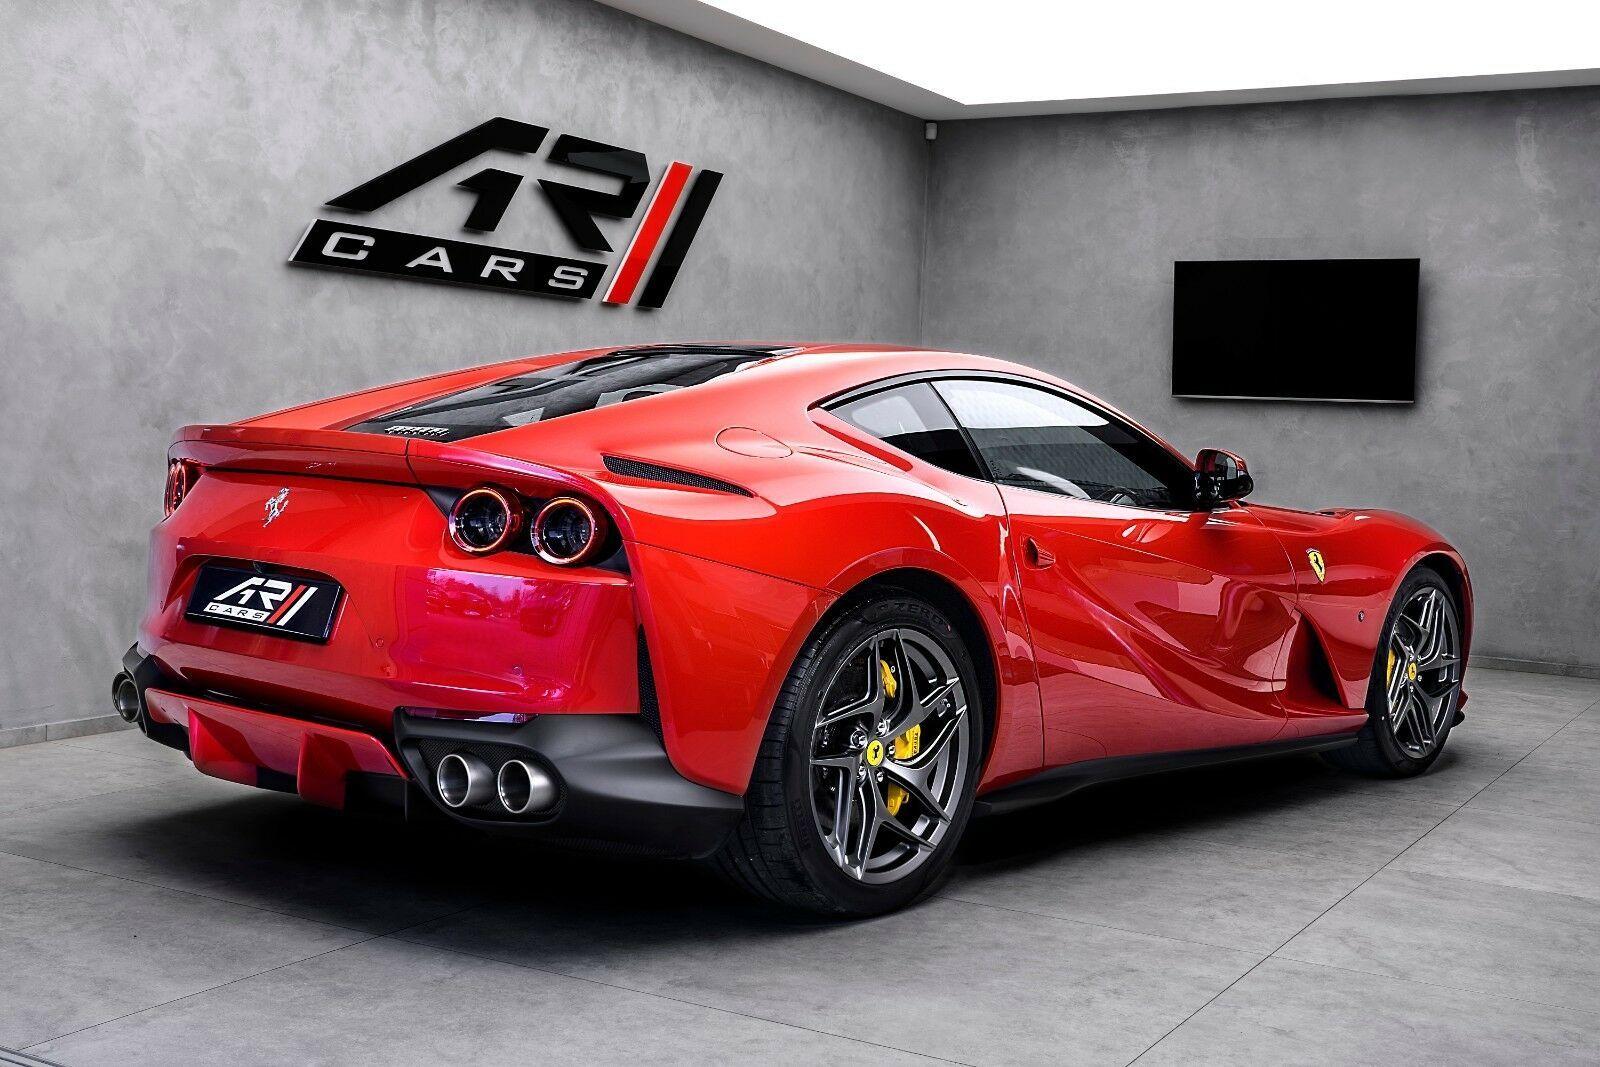 Ferrari 812 Superfast Luxury Pulse Cars Czechia For Sale On Luxurypulse In 2020 Ferrari Cars Ferrari Car